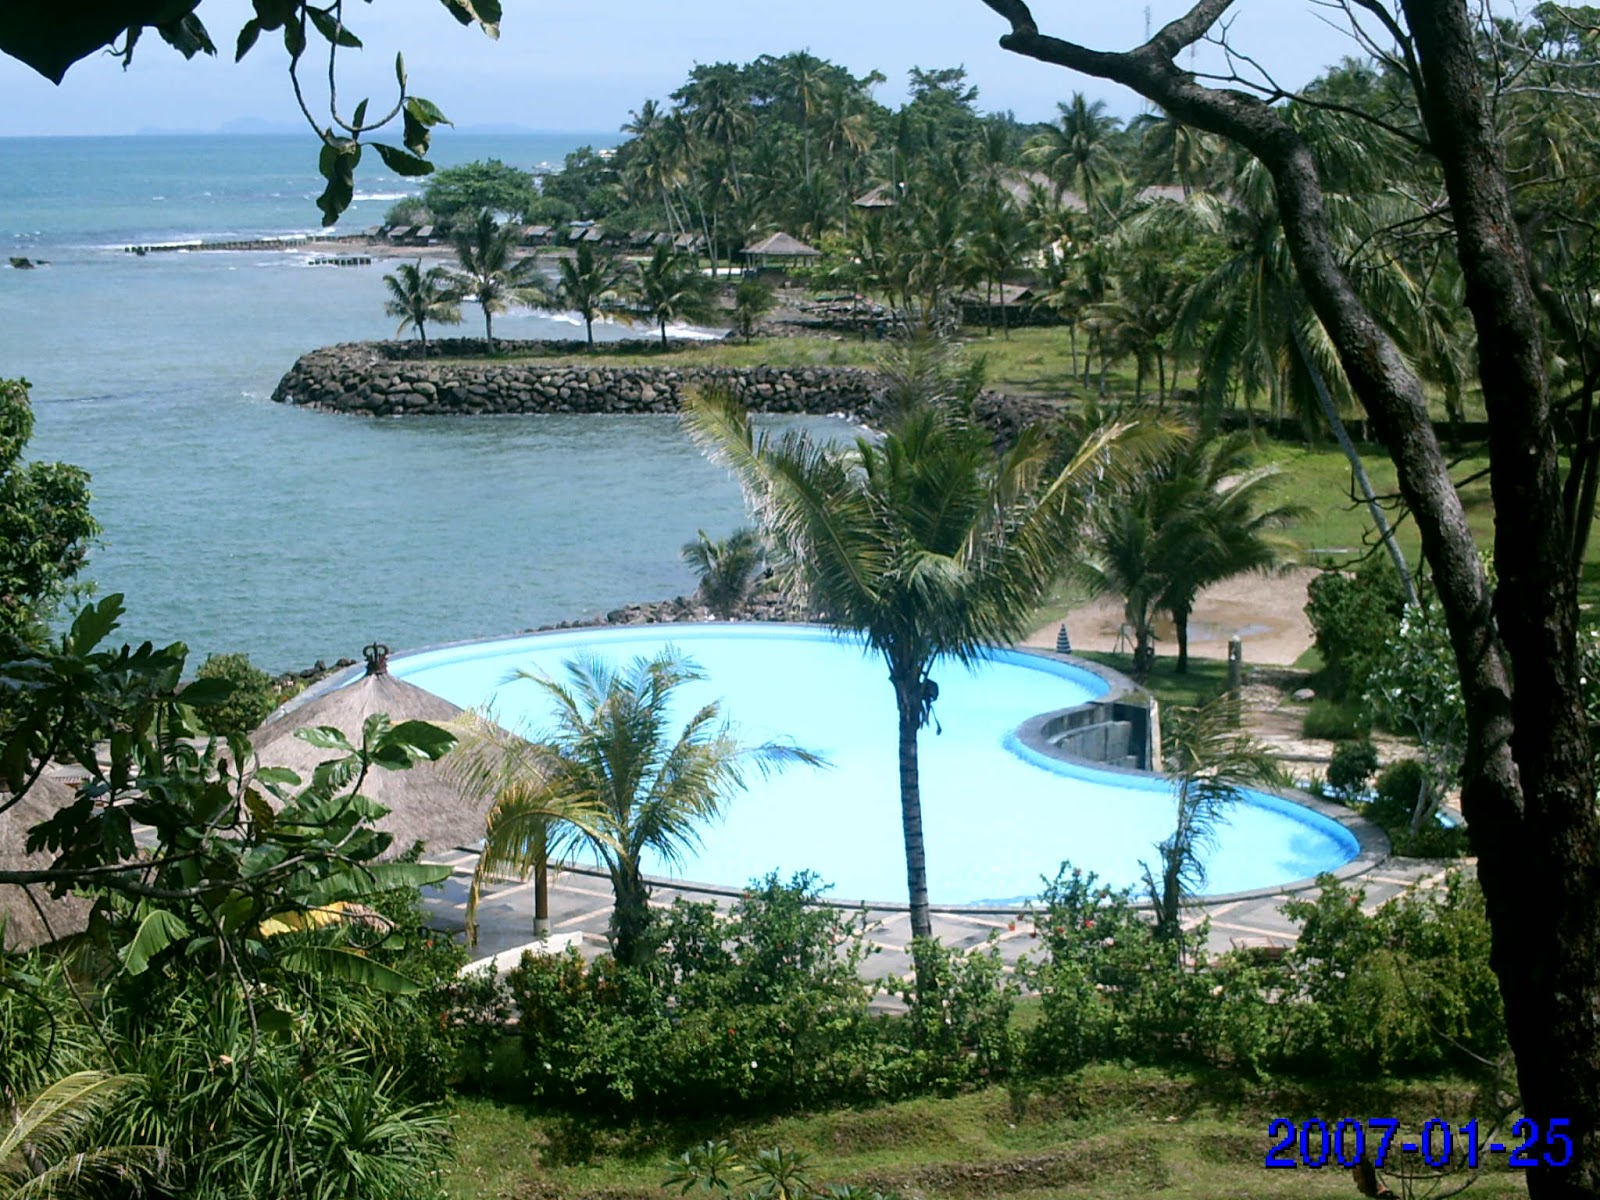 Anyer Trip Casa Krakatoa Hotel And Resort